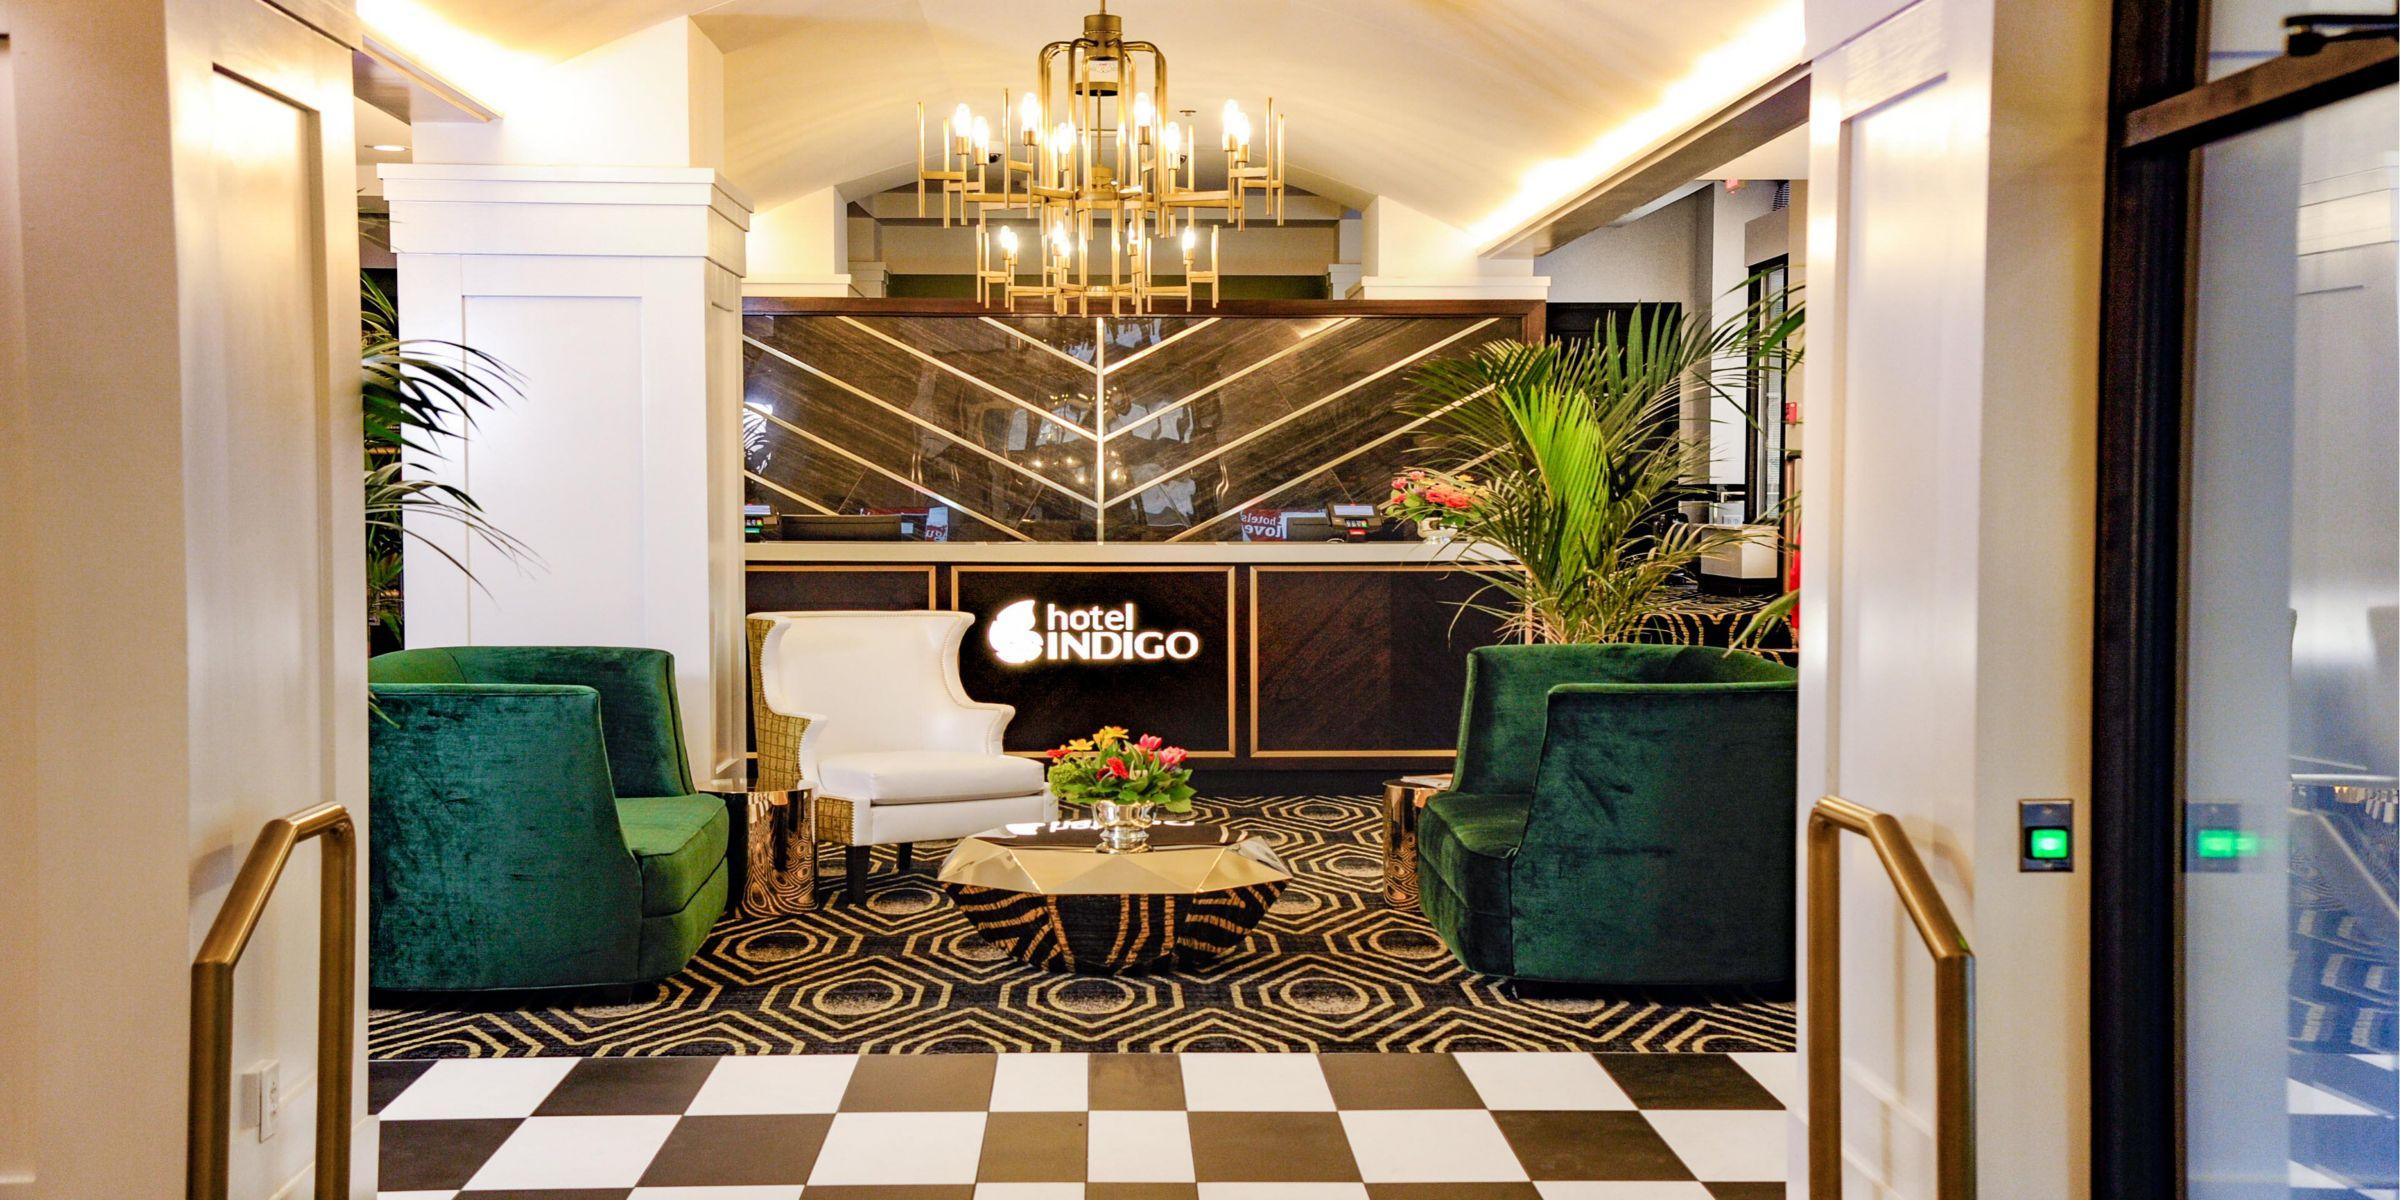 Kansas City Hotels: Hotel Indigo Kansas City Downtown Hotel in ...